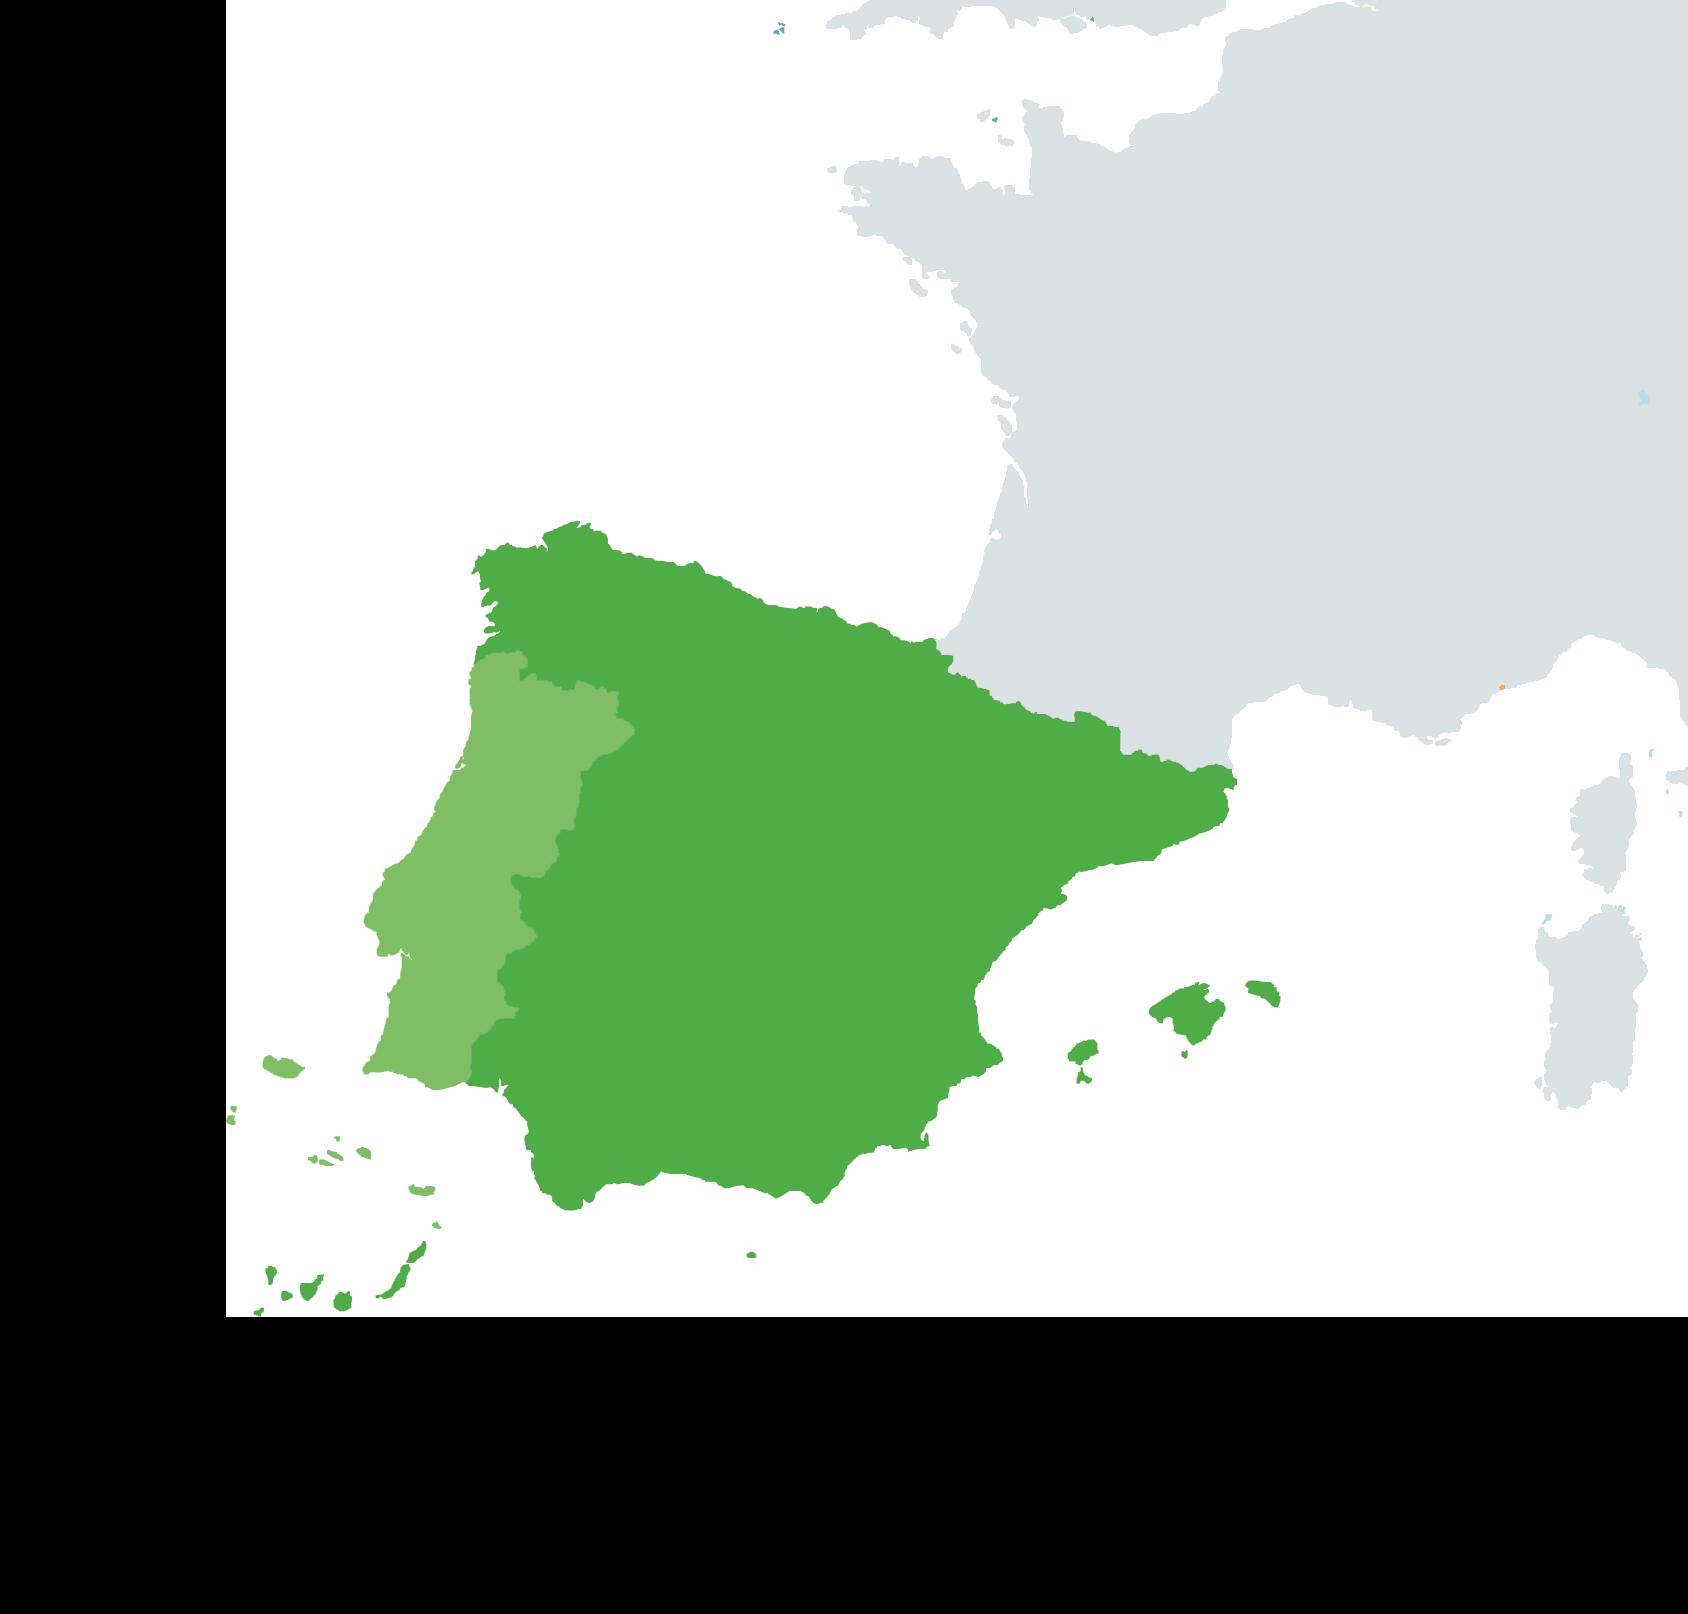 Spain_Portugal_Map